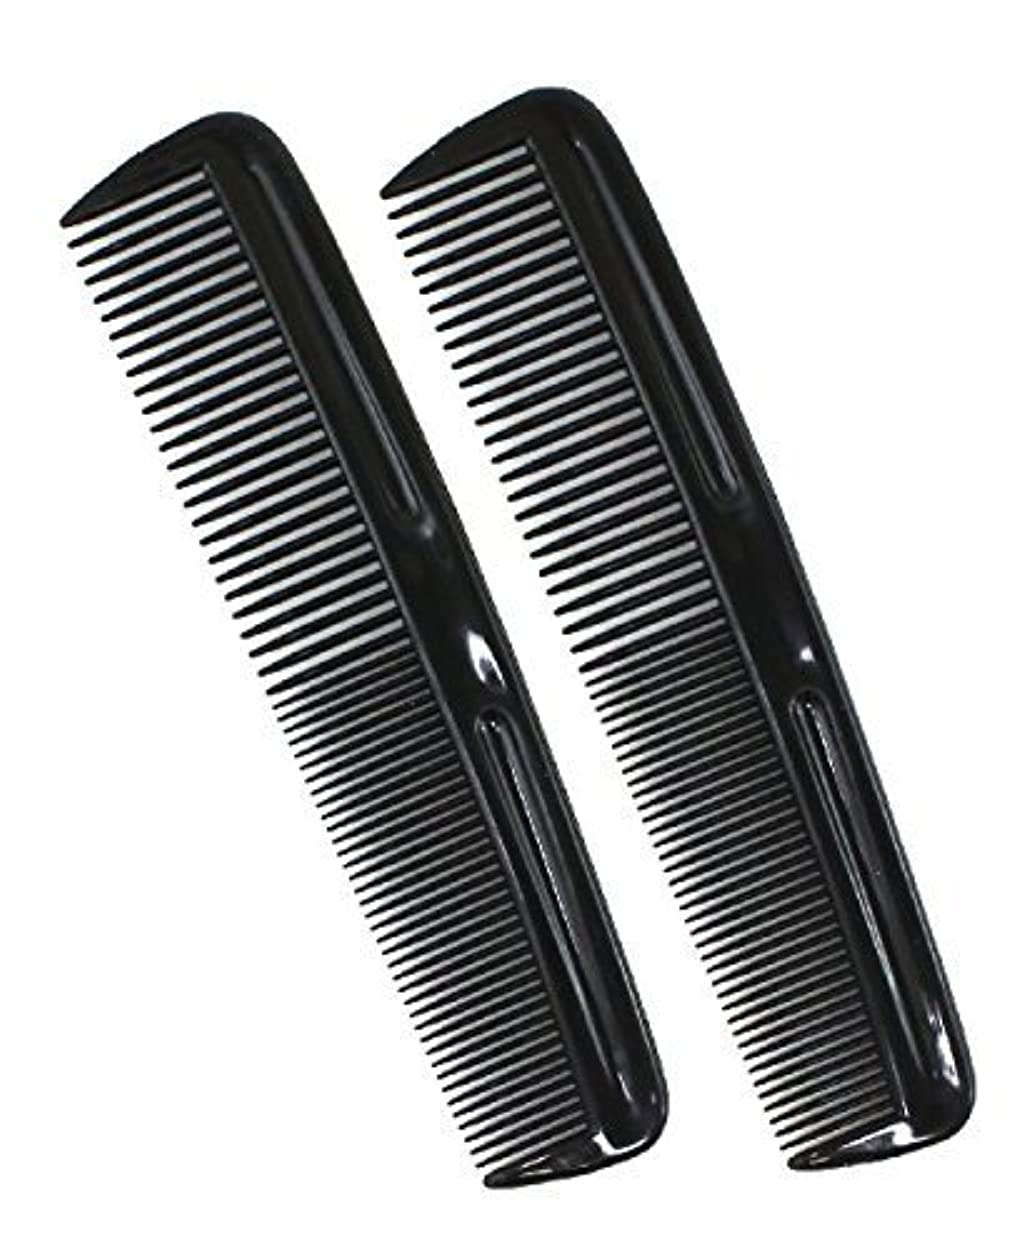 平等満州亡命Hair Care 12-Pack Comb - Not Breakable [並行輸入品]